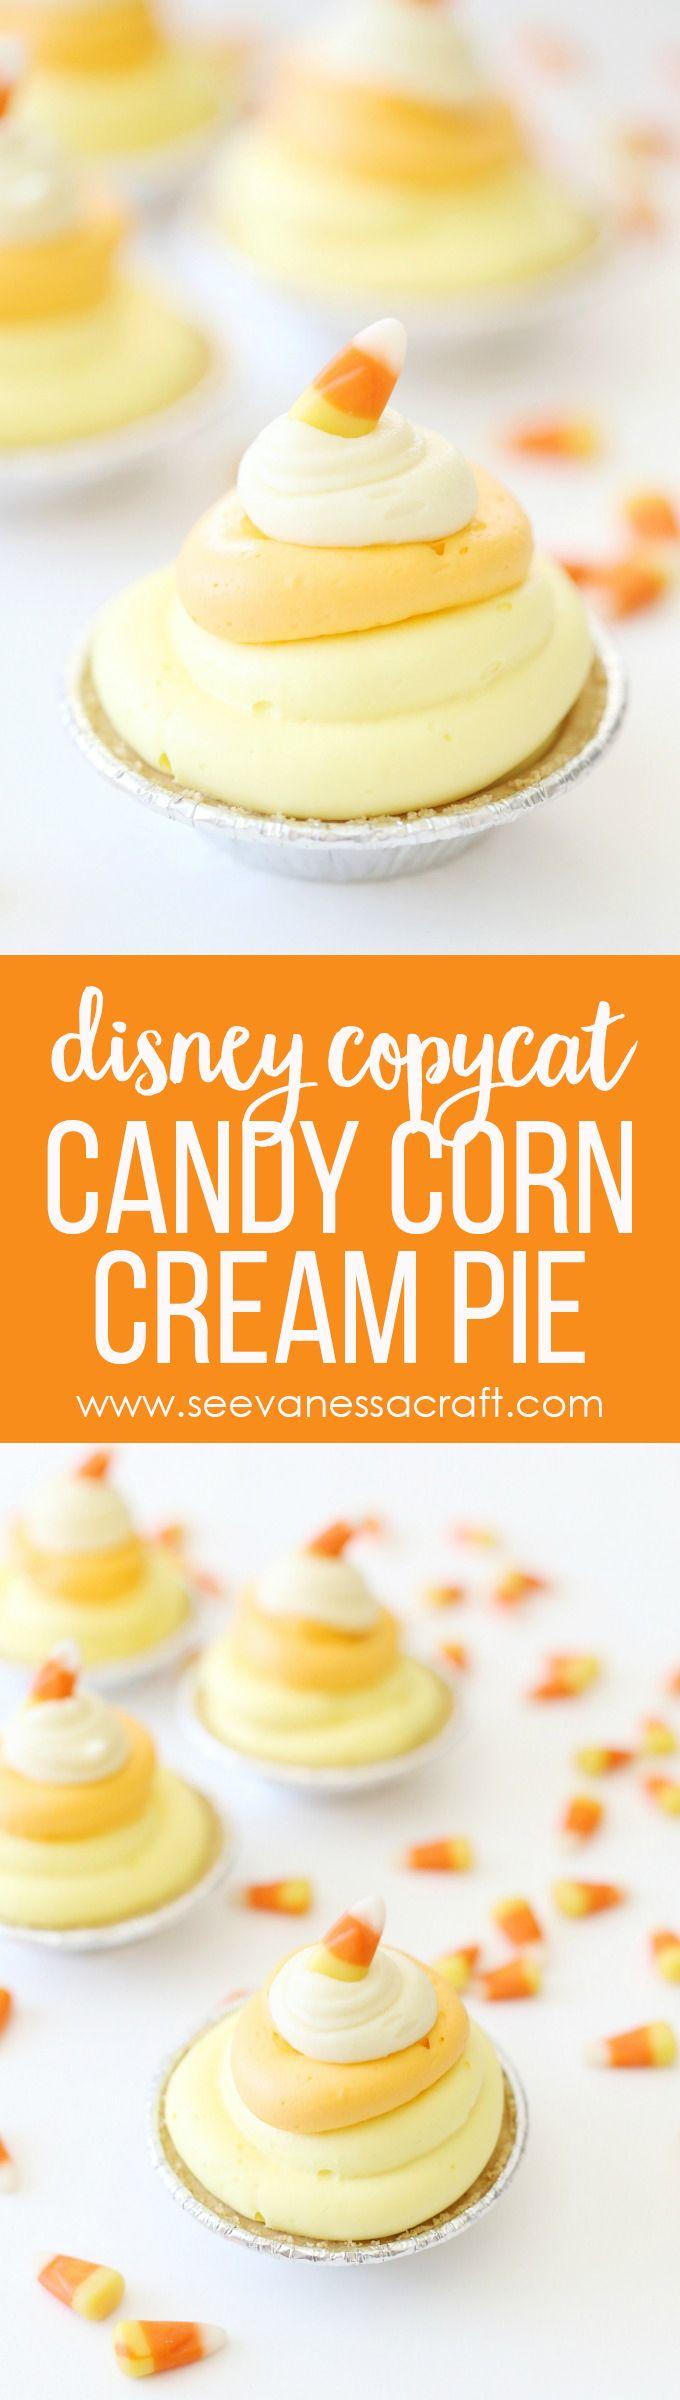 Disneyland Cars Land Copycat Candy Corn Cream Mini Pie Recipe copy